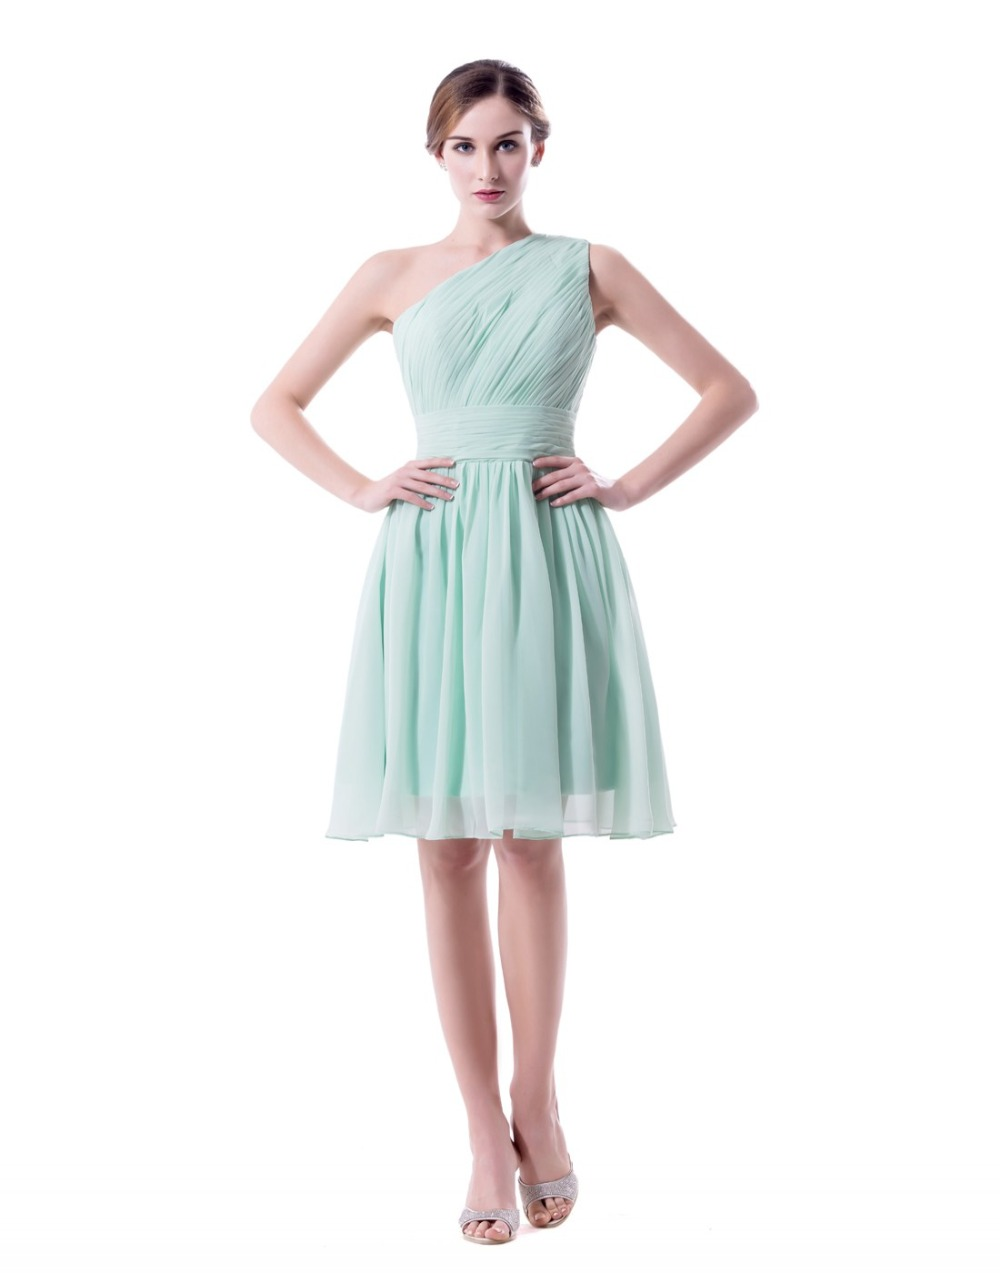 Popular short bridesmaid dress mint buy cheap short bridesmaid sage mint green short bridesmaid dresses one shoulder plus size 2017 chiffon wedding party dresses maid ombrellifo Images